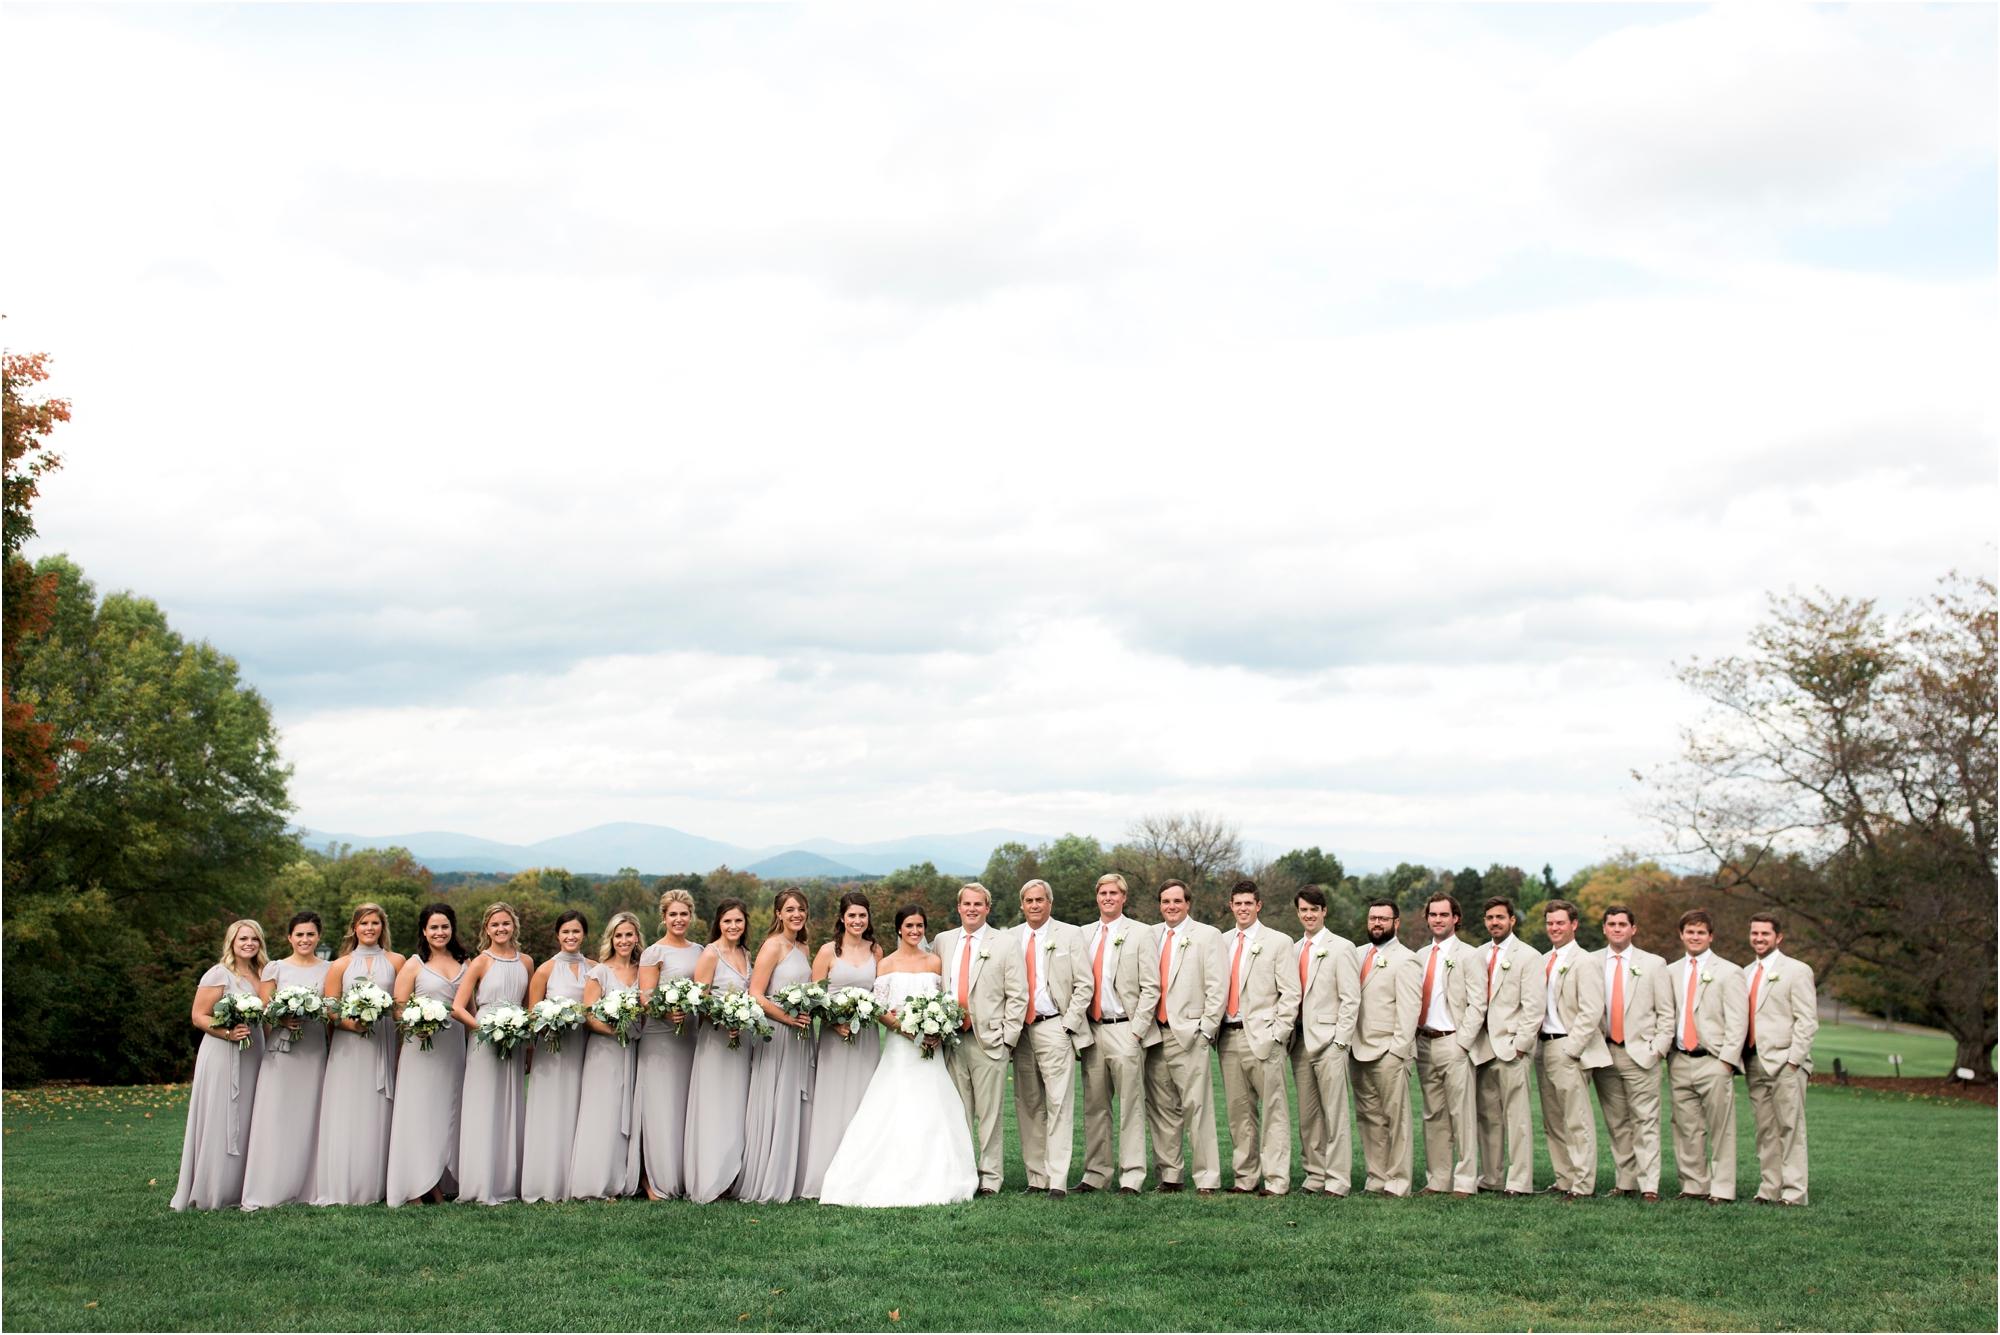 claire-thomas-farmington-country-club-charlottesville-virginia-wedding-photos_0014.jpg